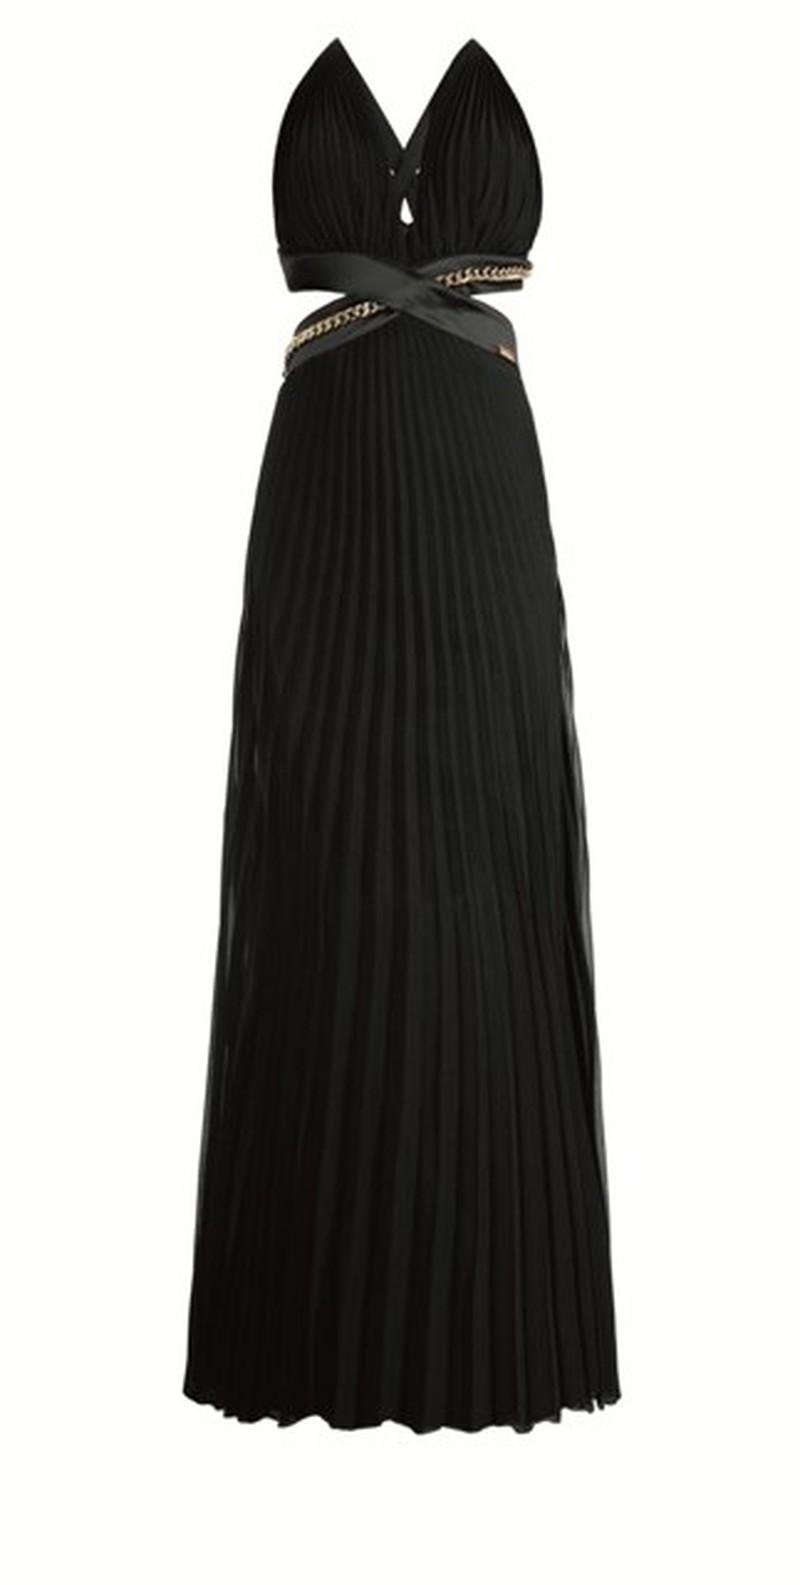 Elisabetta Franchi Celyn b - Sukienki na wiosnę i lato 2011